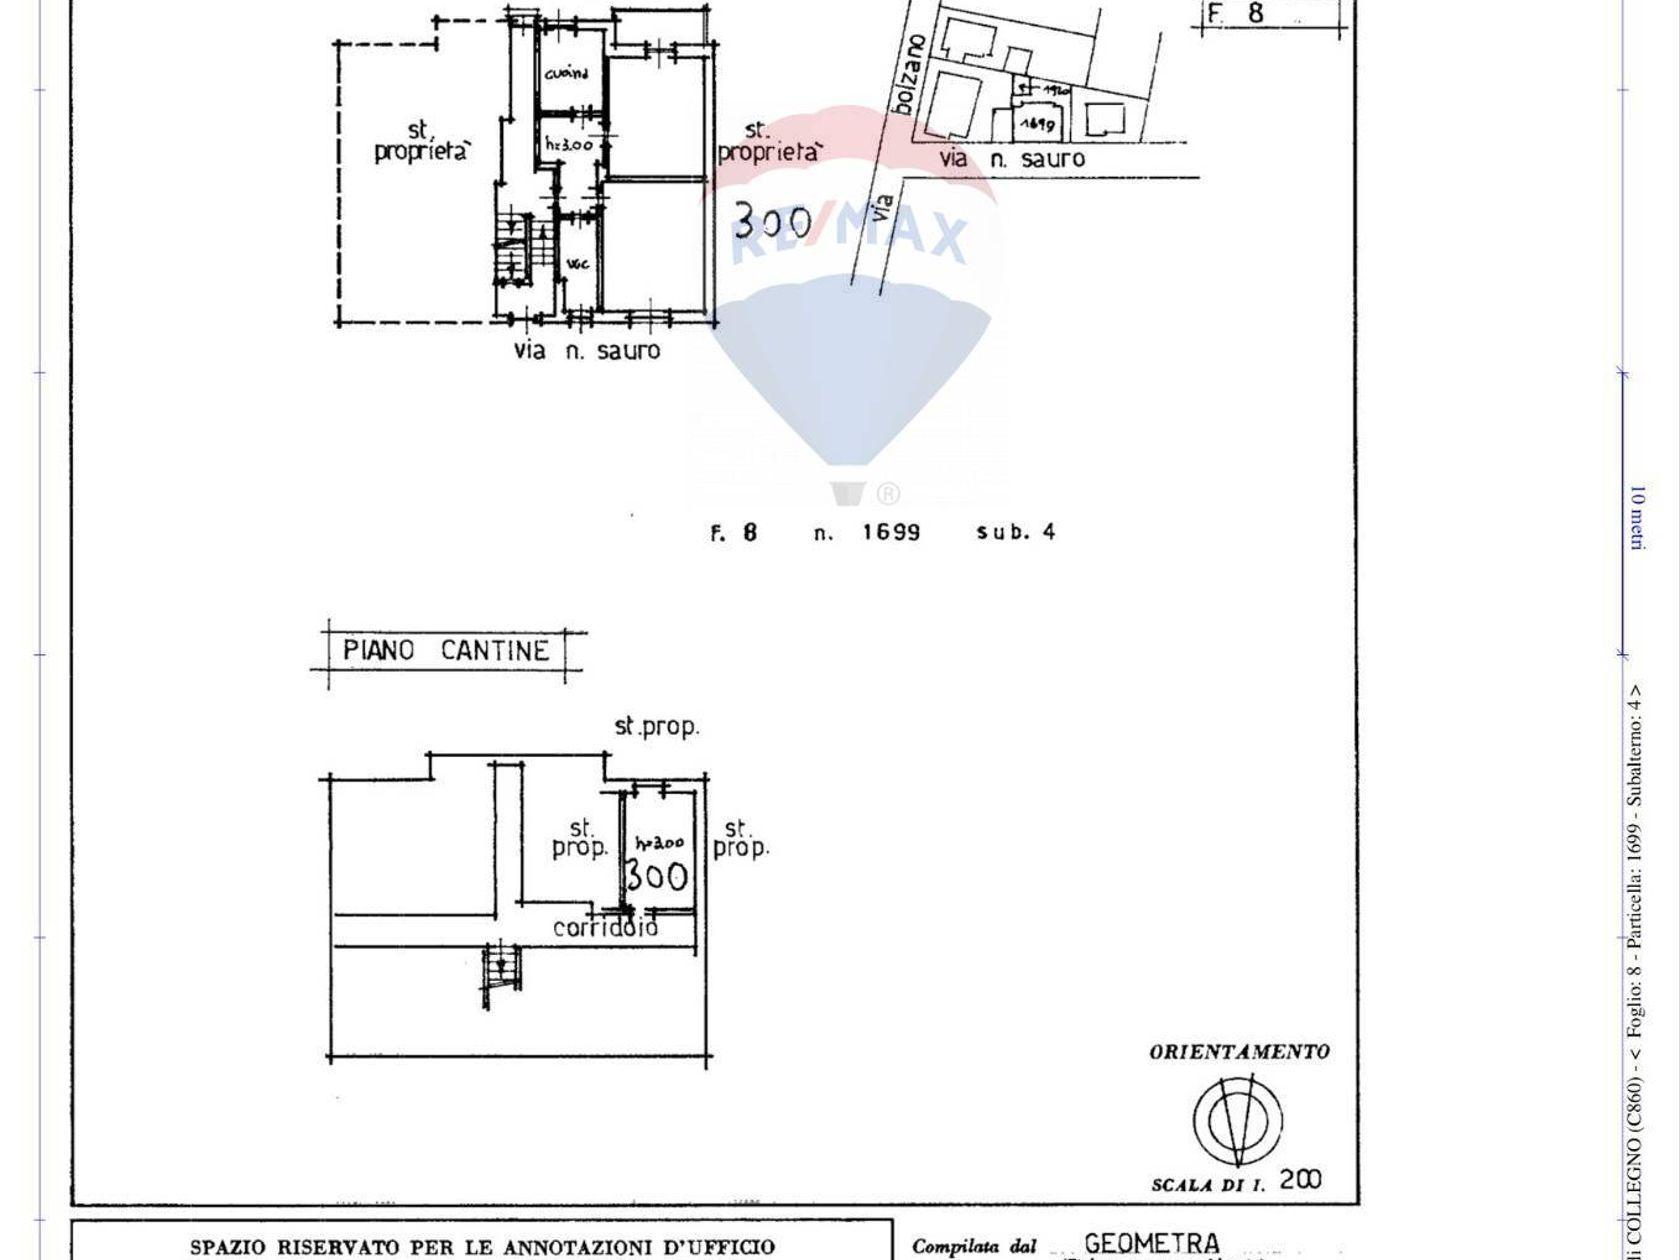 Casa Indipendente Santa Maria, Collegno, TO Vendita - Planimetria 2